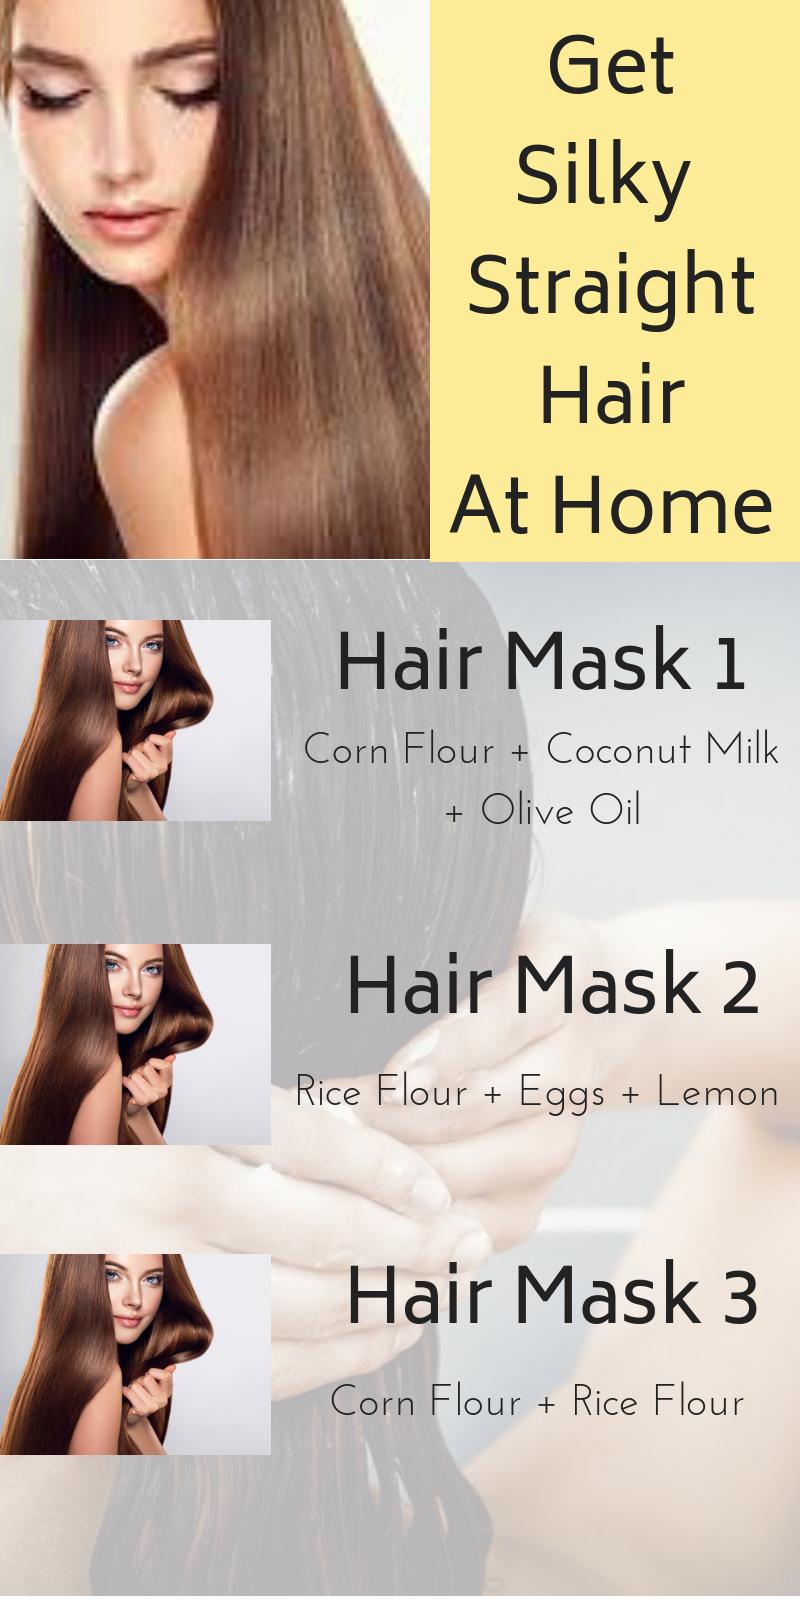 Diy Hair Straightening Hair Masks That Will Make Your Hair Silky Straight Hair Haircare Diy Howto Hairma Best Hair Mask Straightening Hair Tips Silky Hair